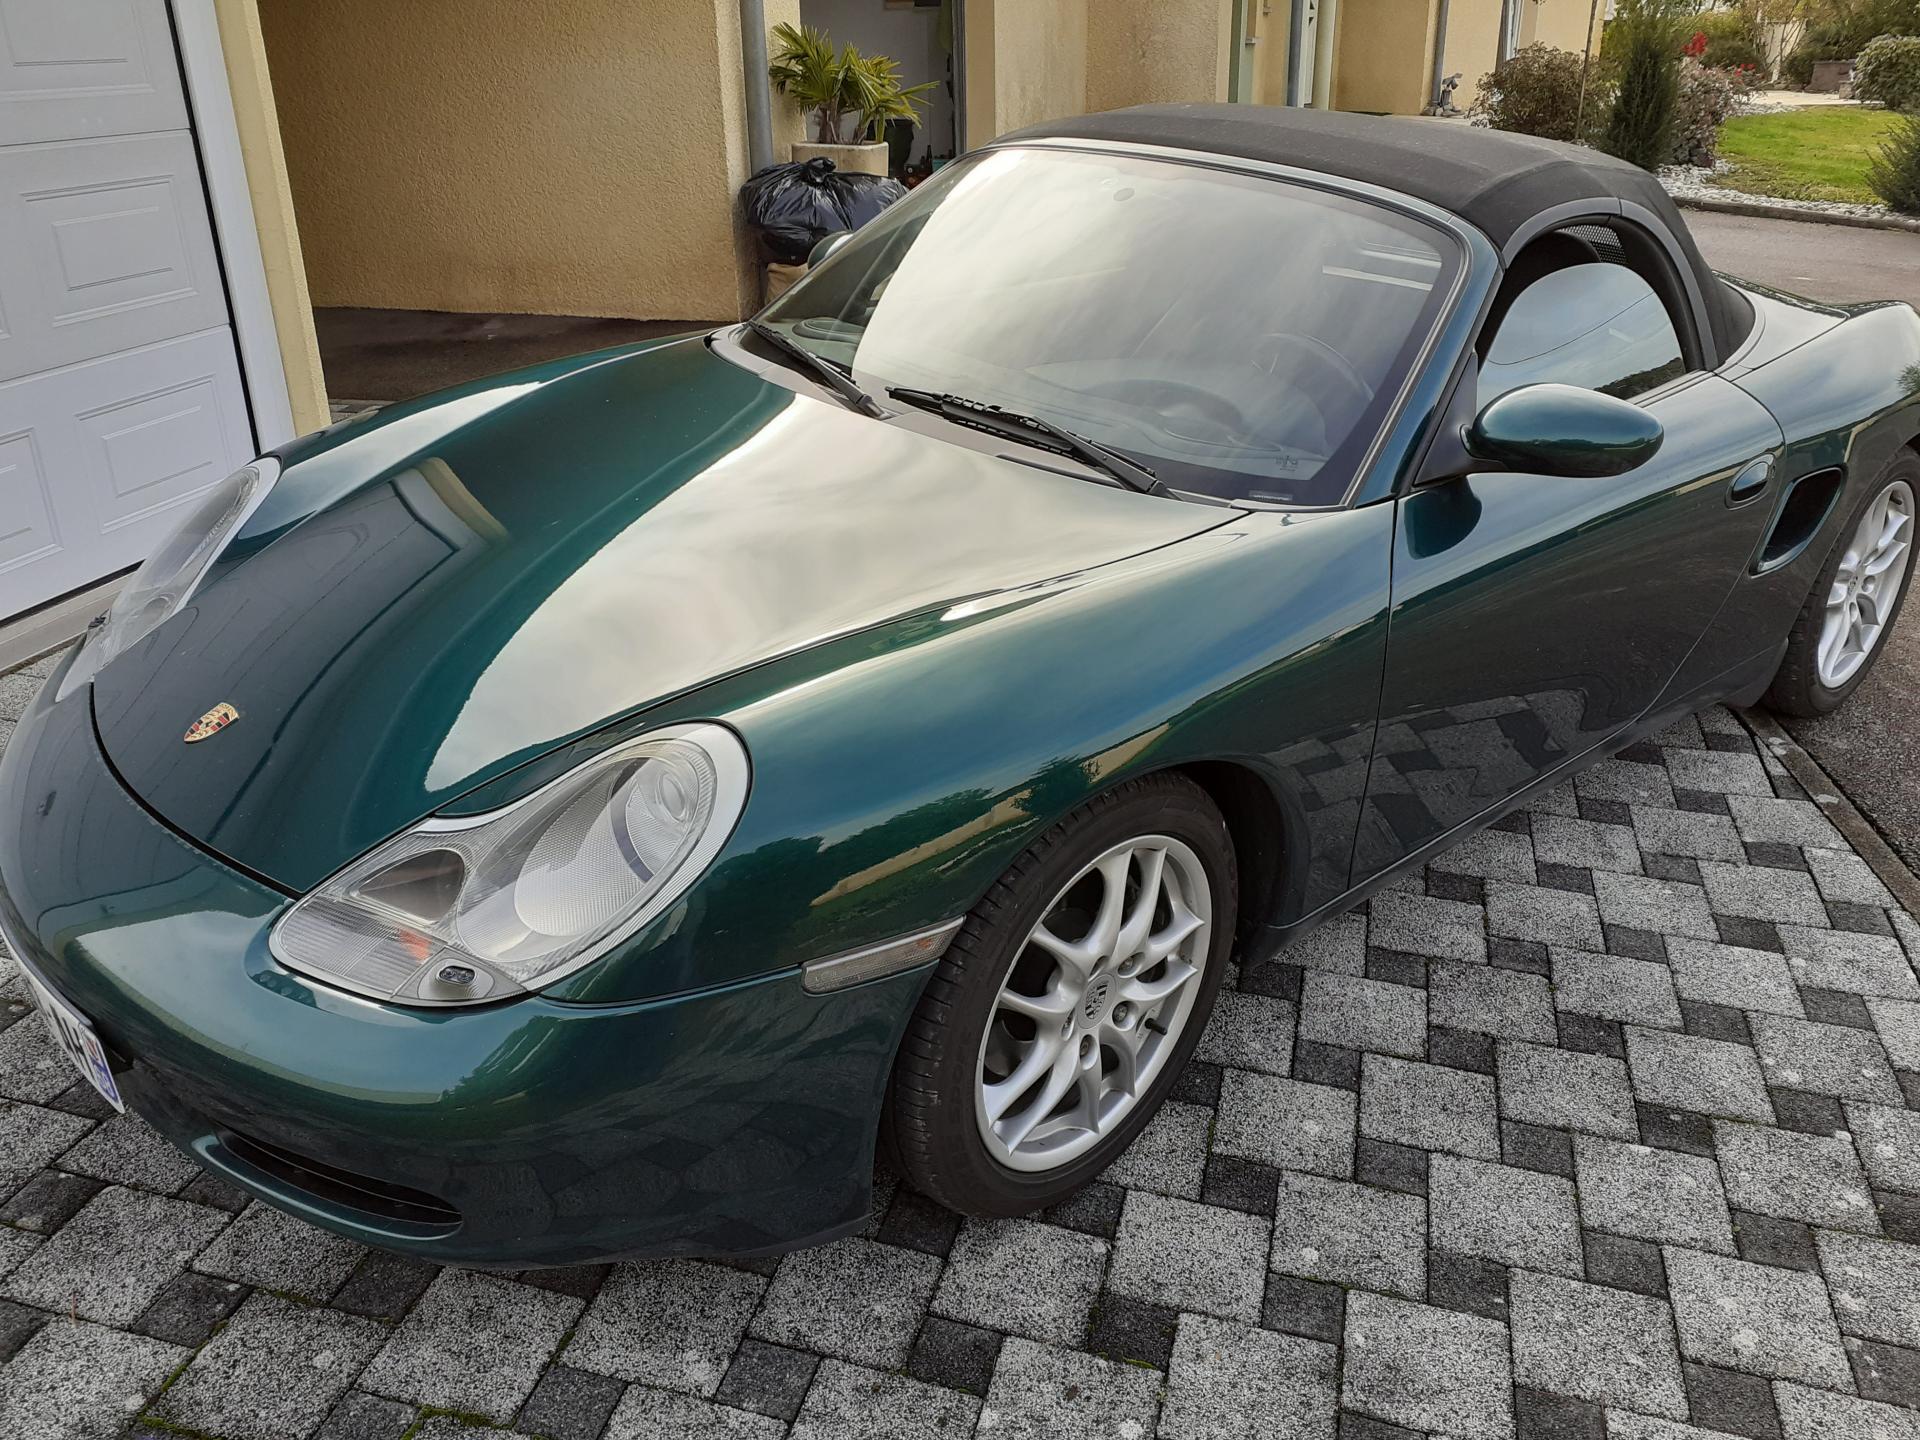 Porsche Boxster 986 2.7 220 ch (Boxster)